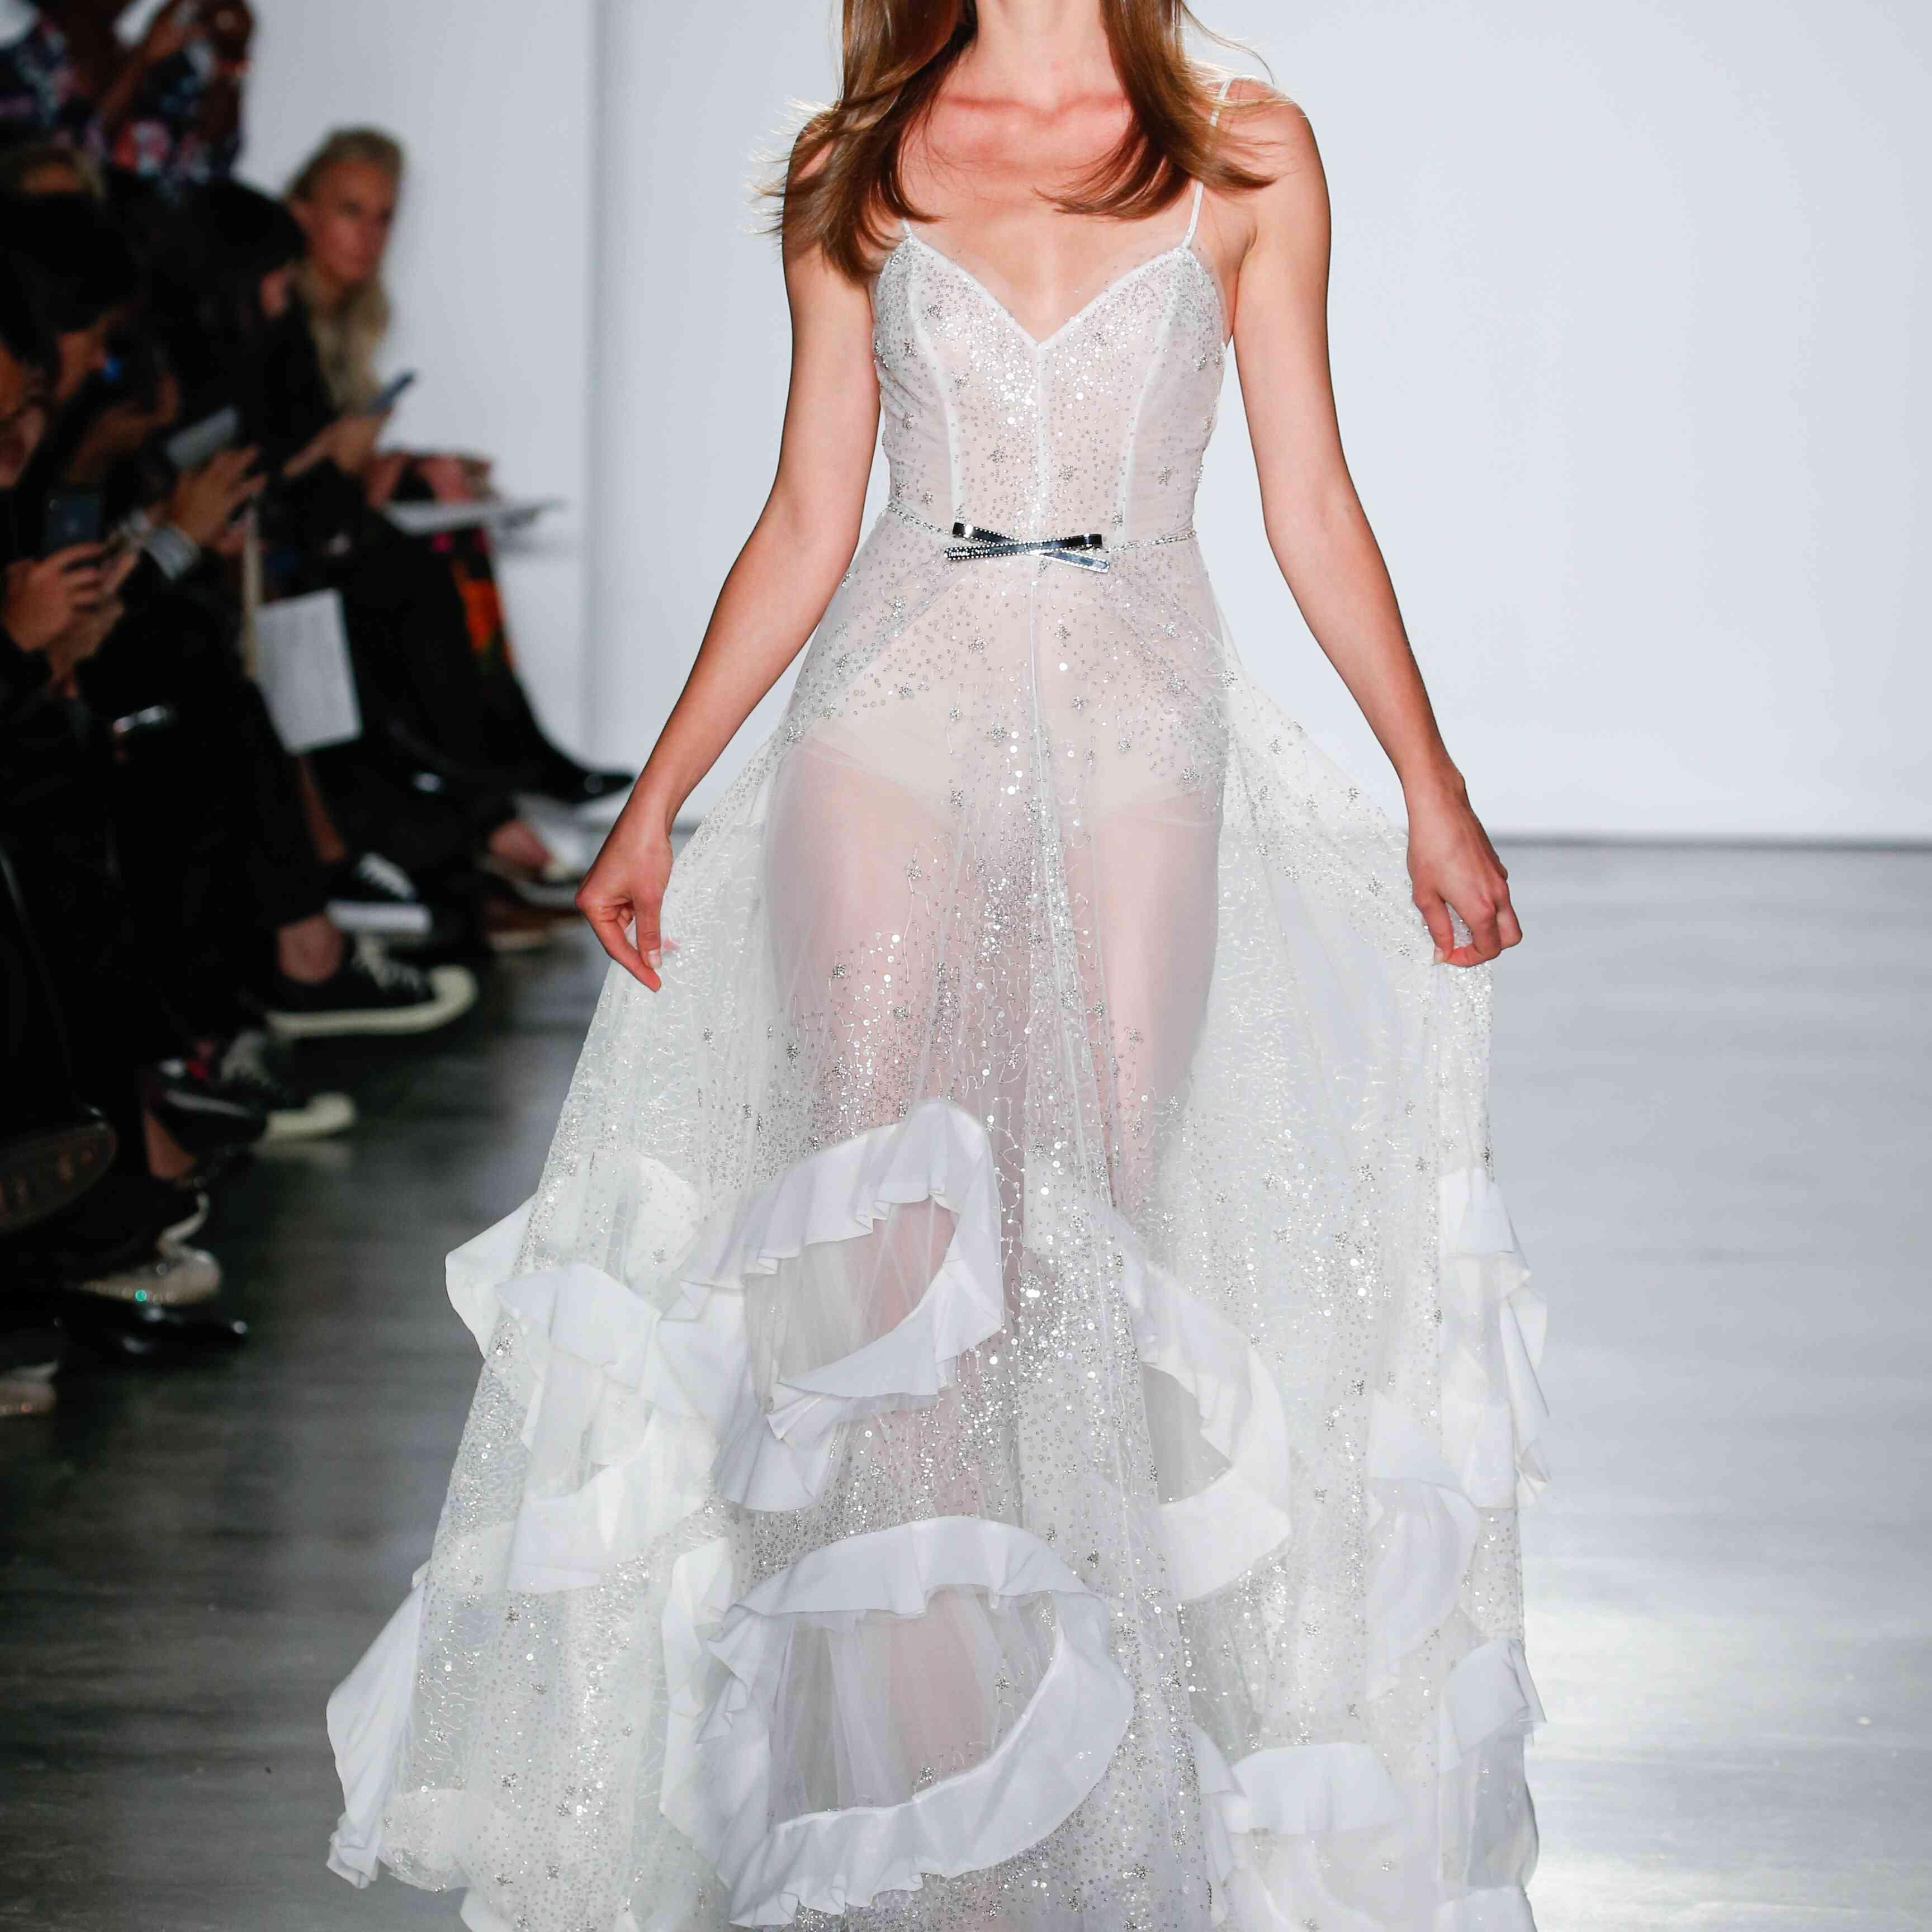 Model in spaghetti strap wedding dress